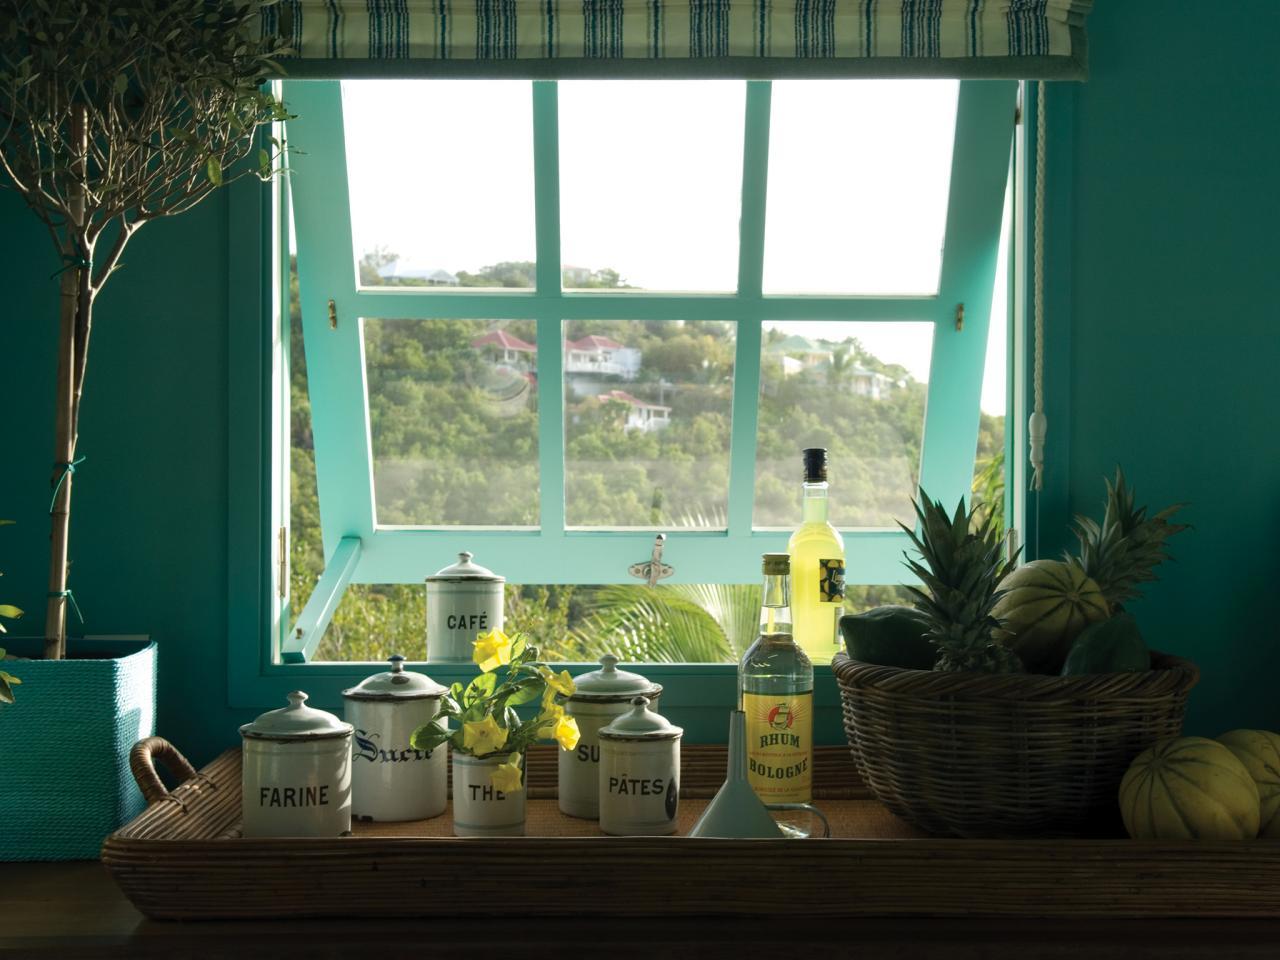 Kitchen Jalousie Windows